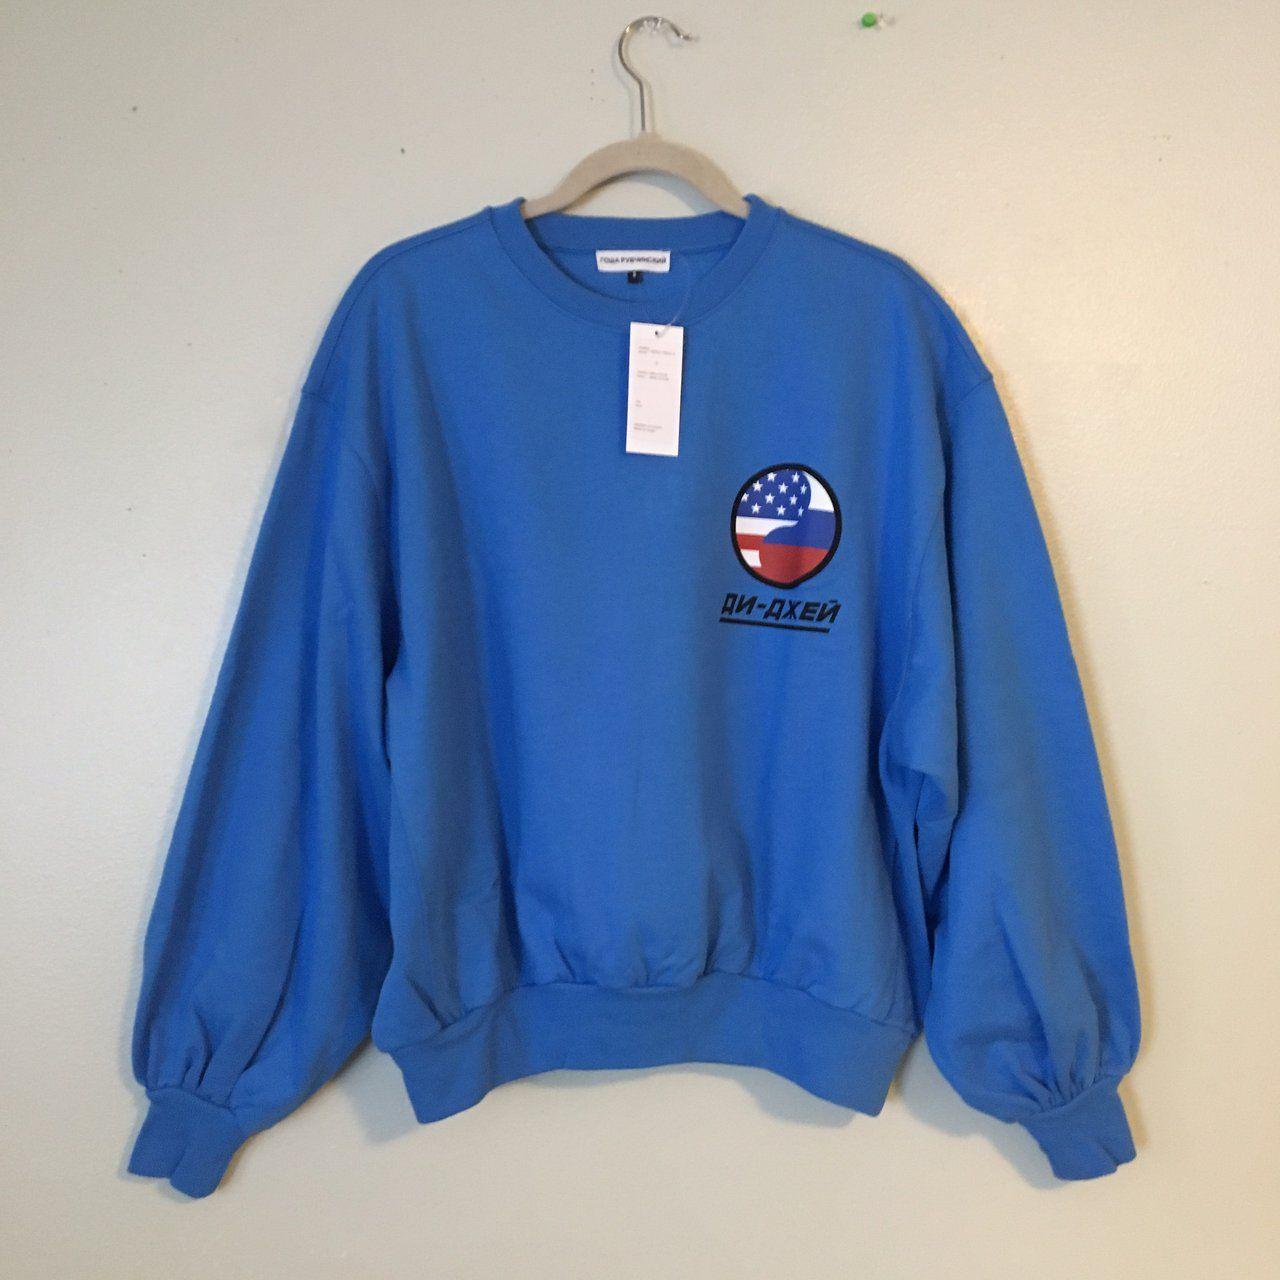 94c5b726ac3 Gosha Rubchinskiy DJ Logo crew sweatshirt. Brand color an - Depop ...